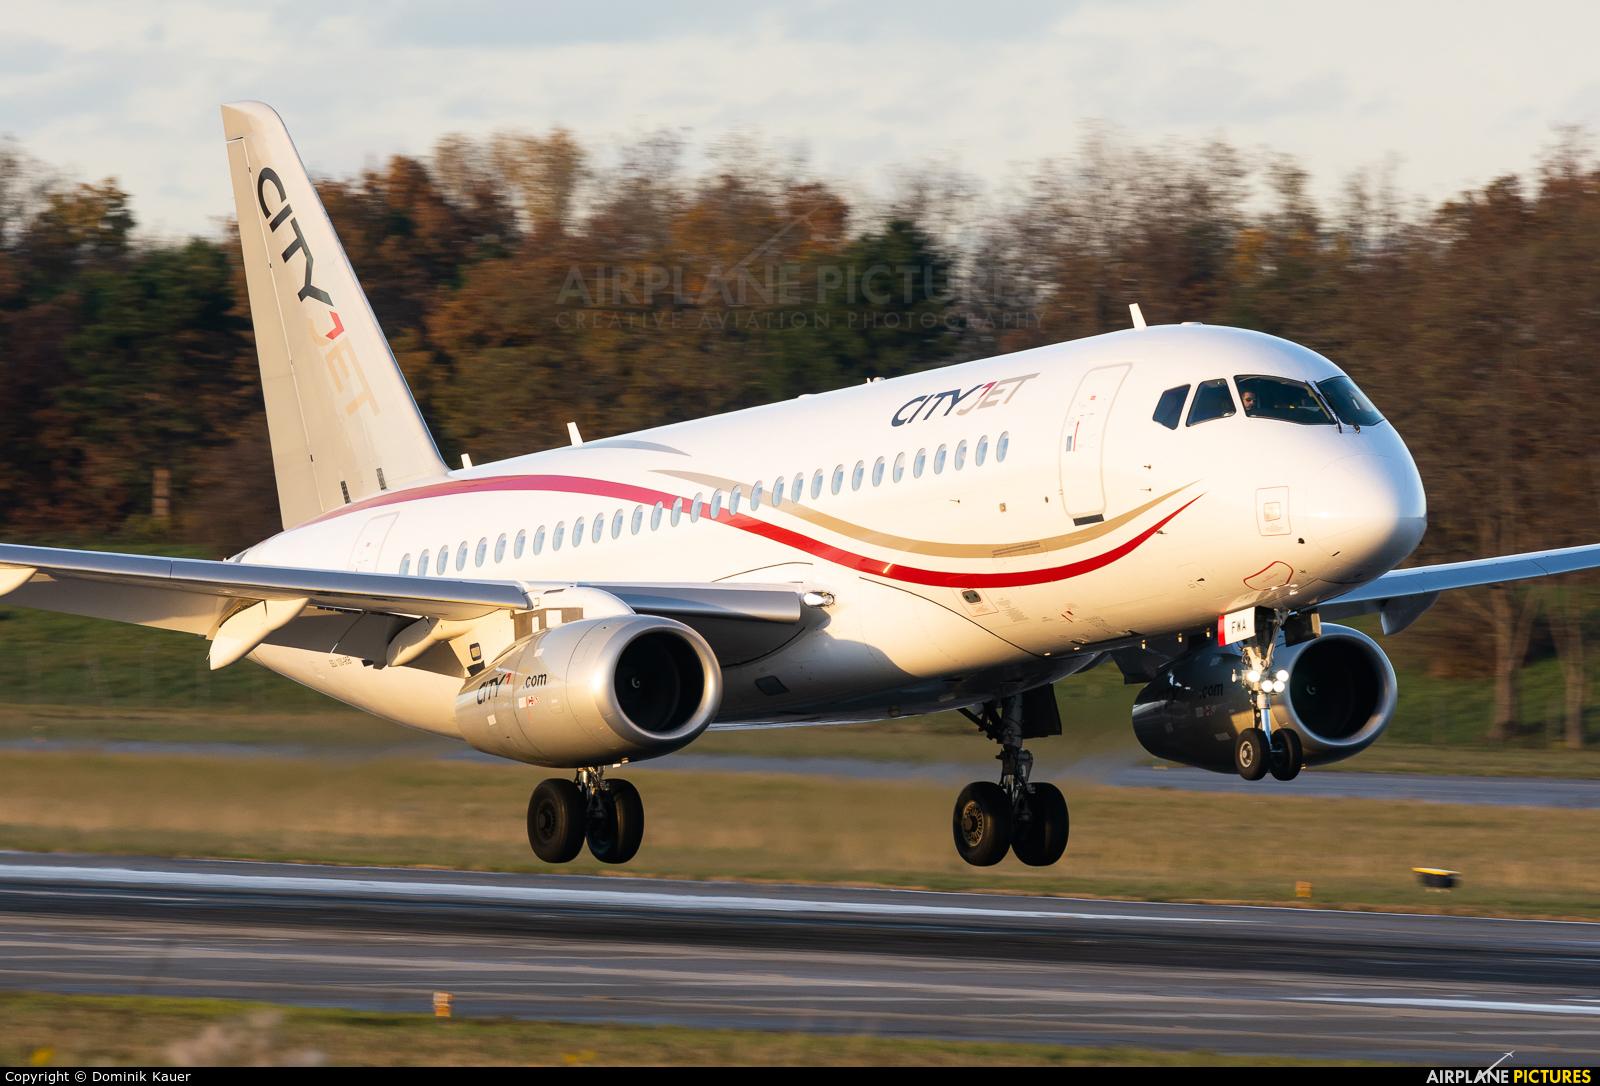 CityJet EI-FWA aircraft at Basel - Mulhouse- Euro